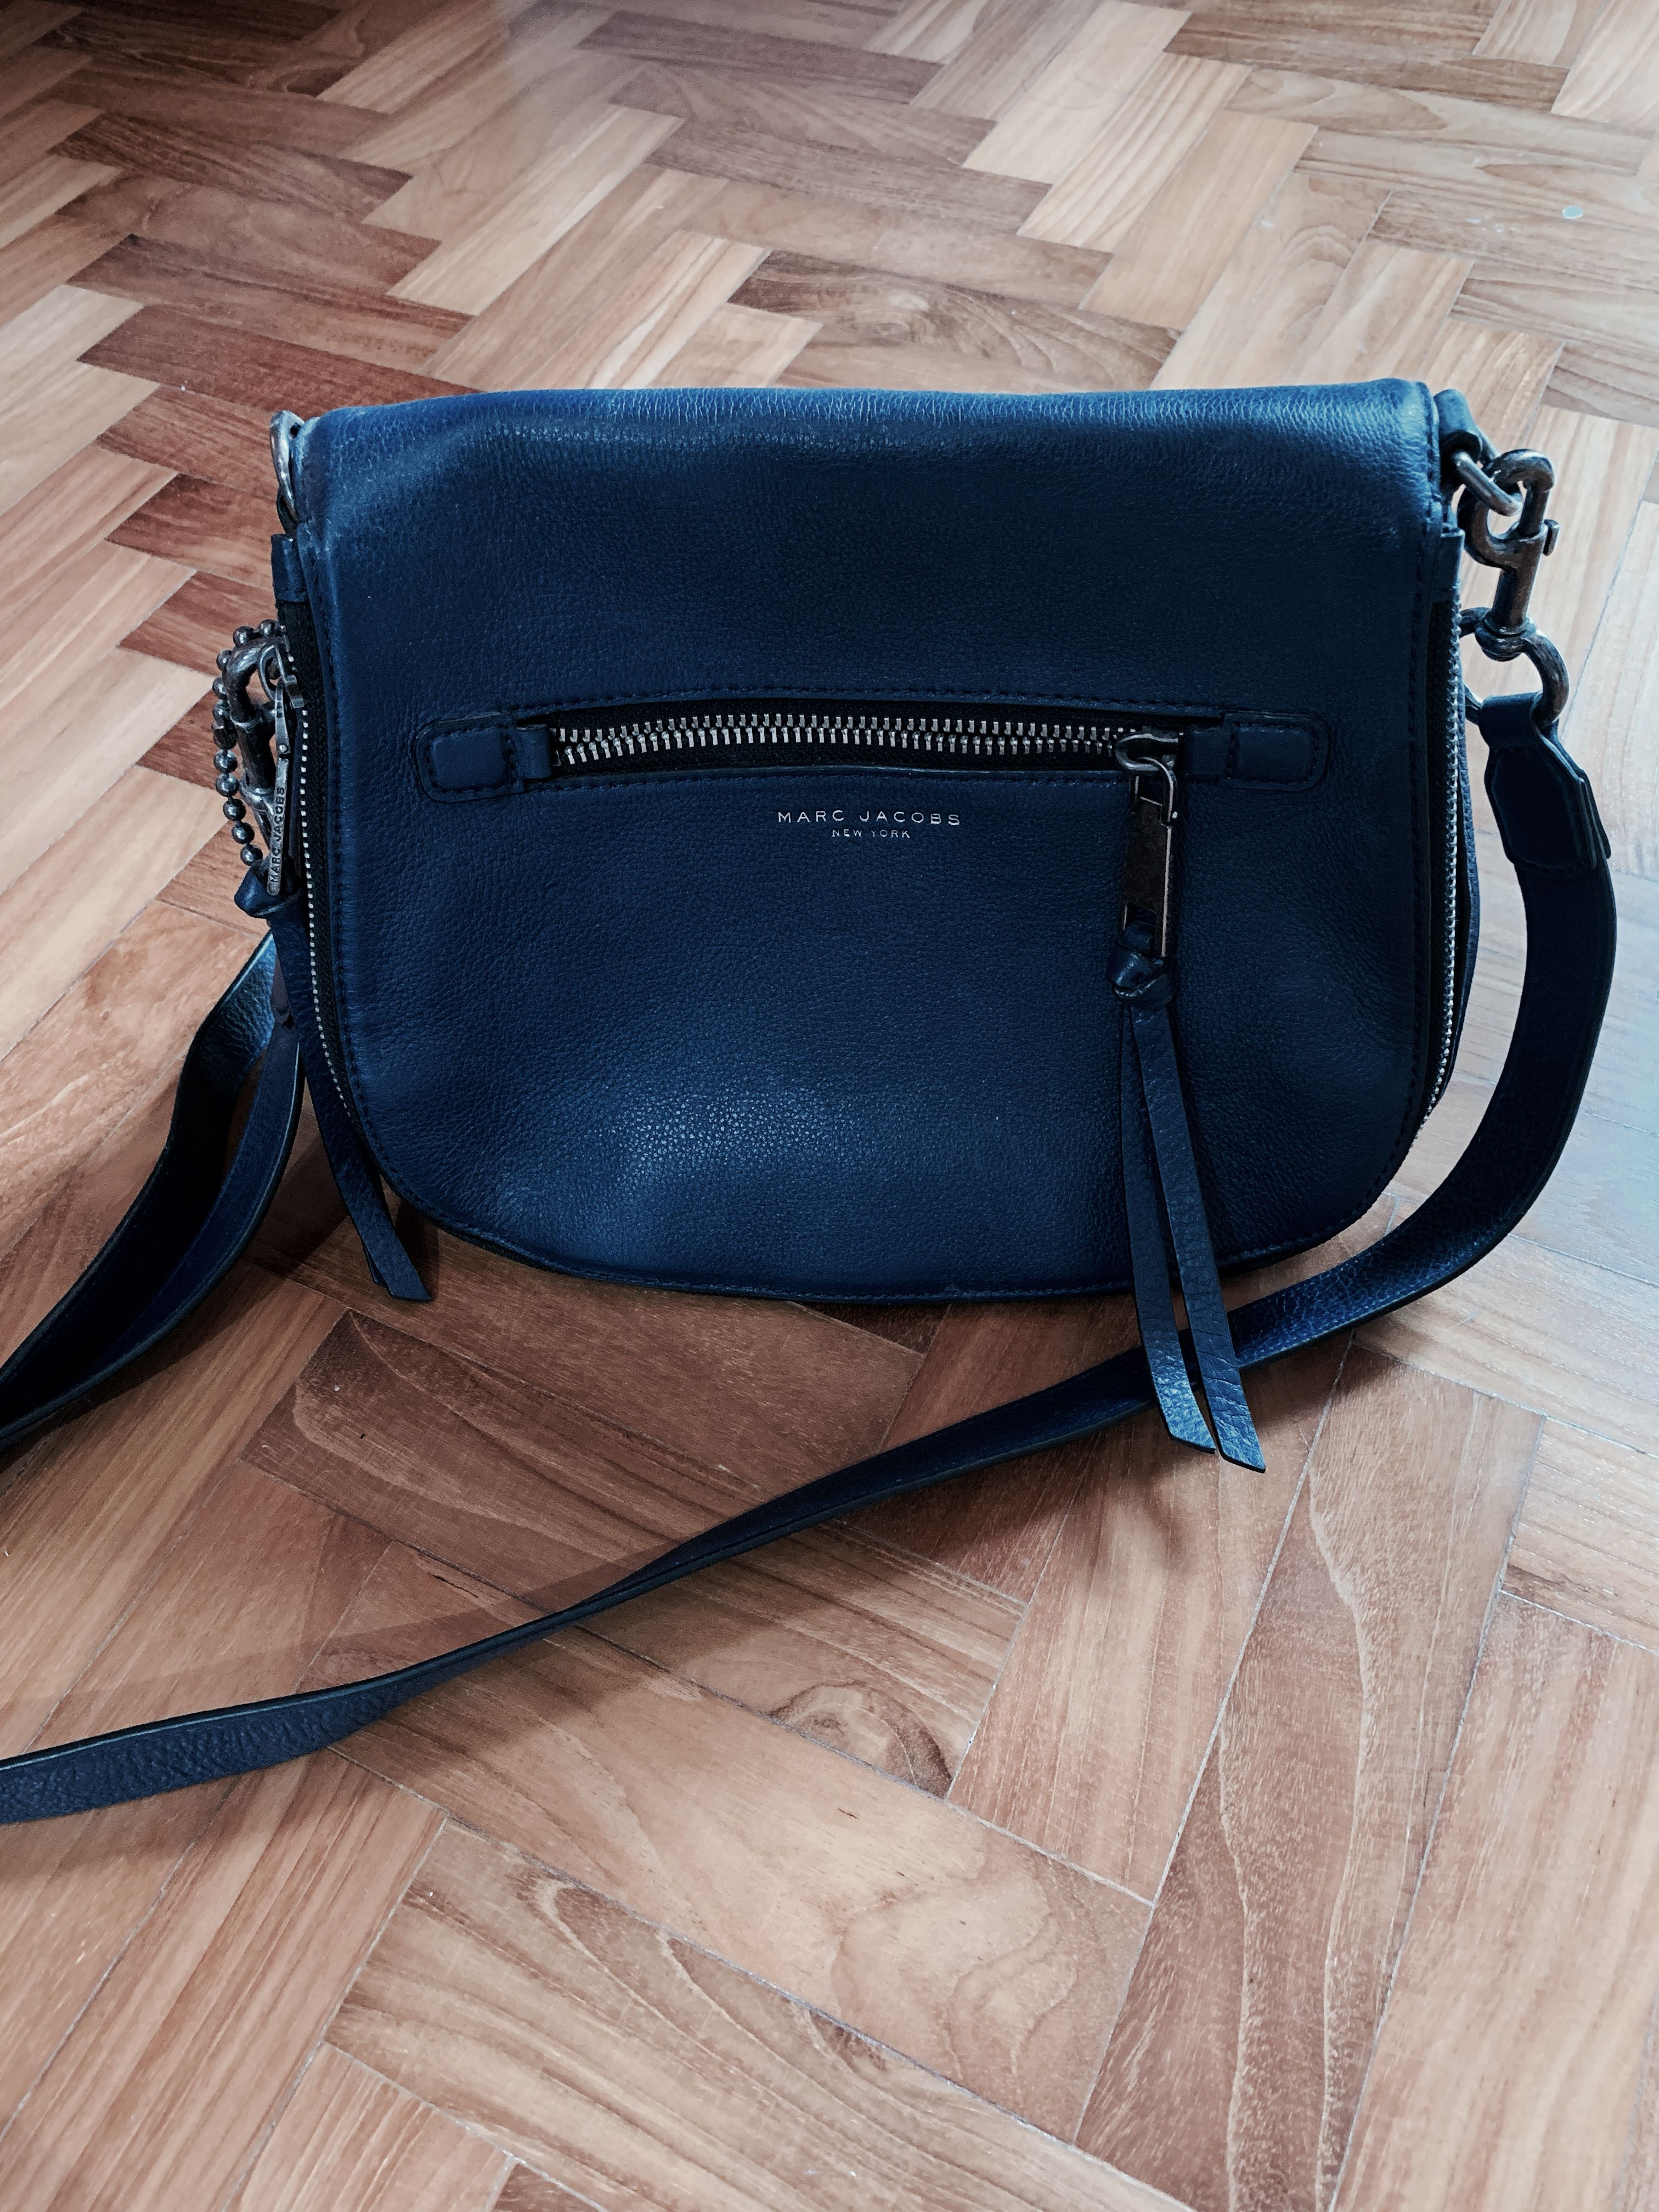 729b8035f9b5 ... Handbags. photo photo photo photo photo